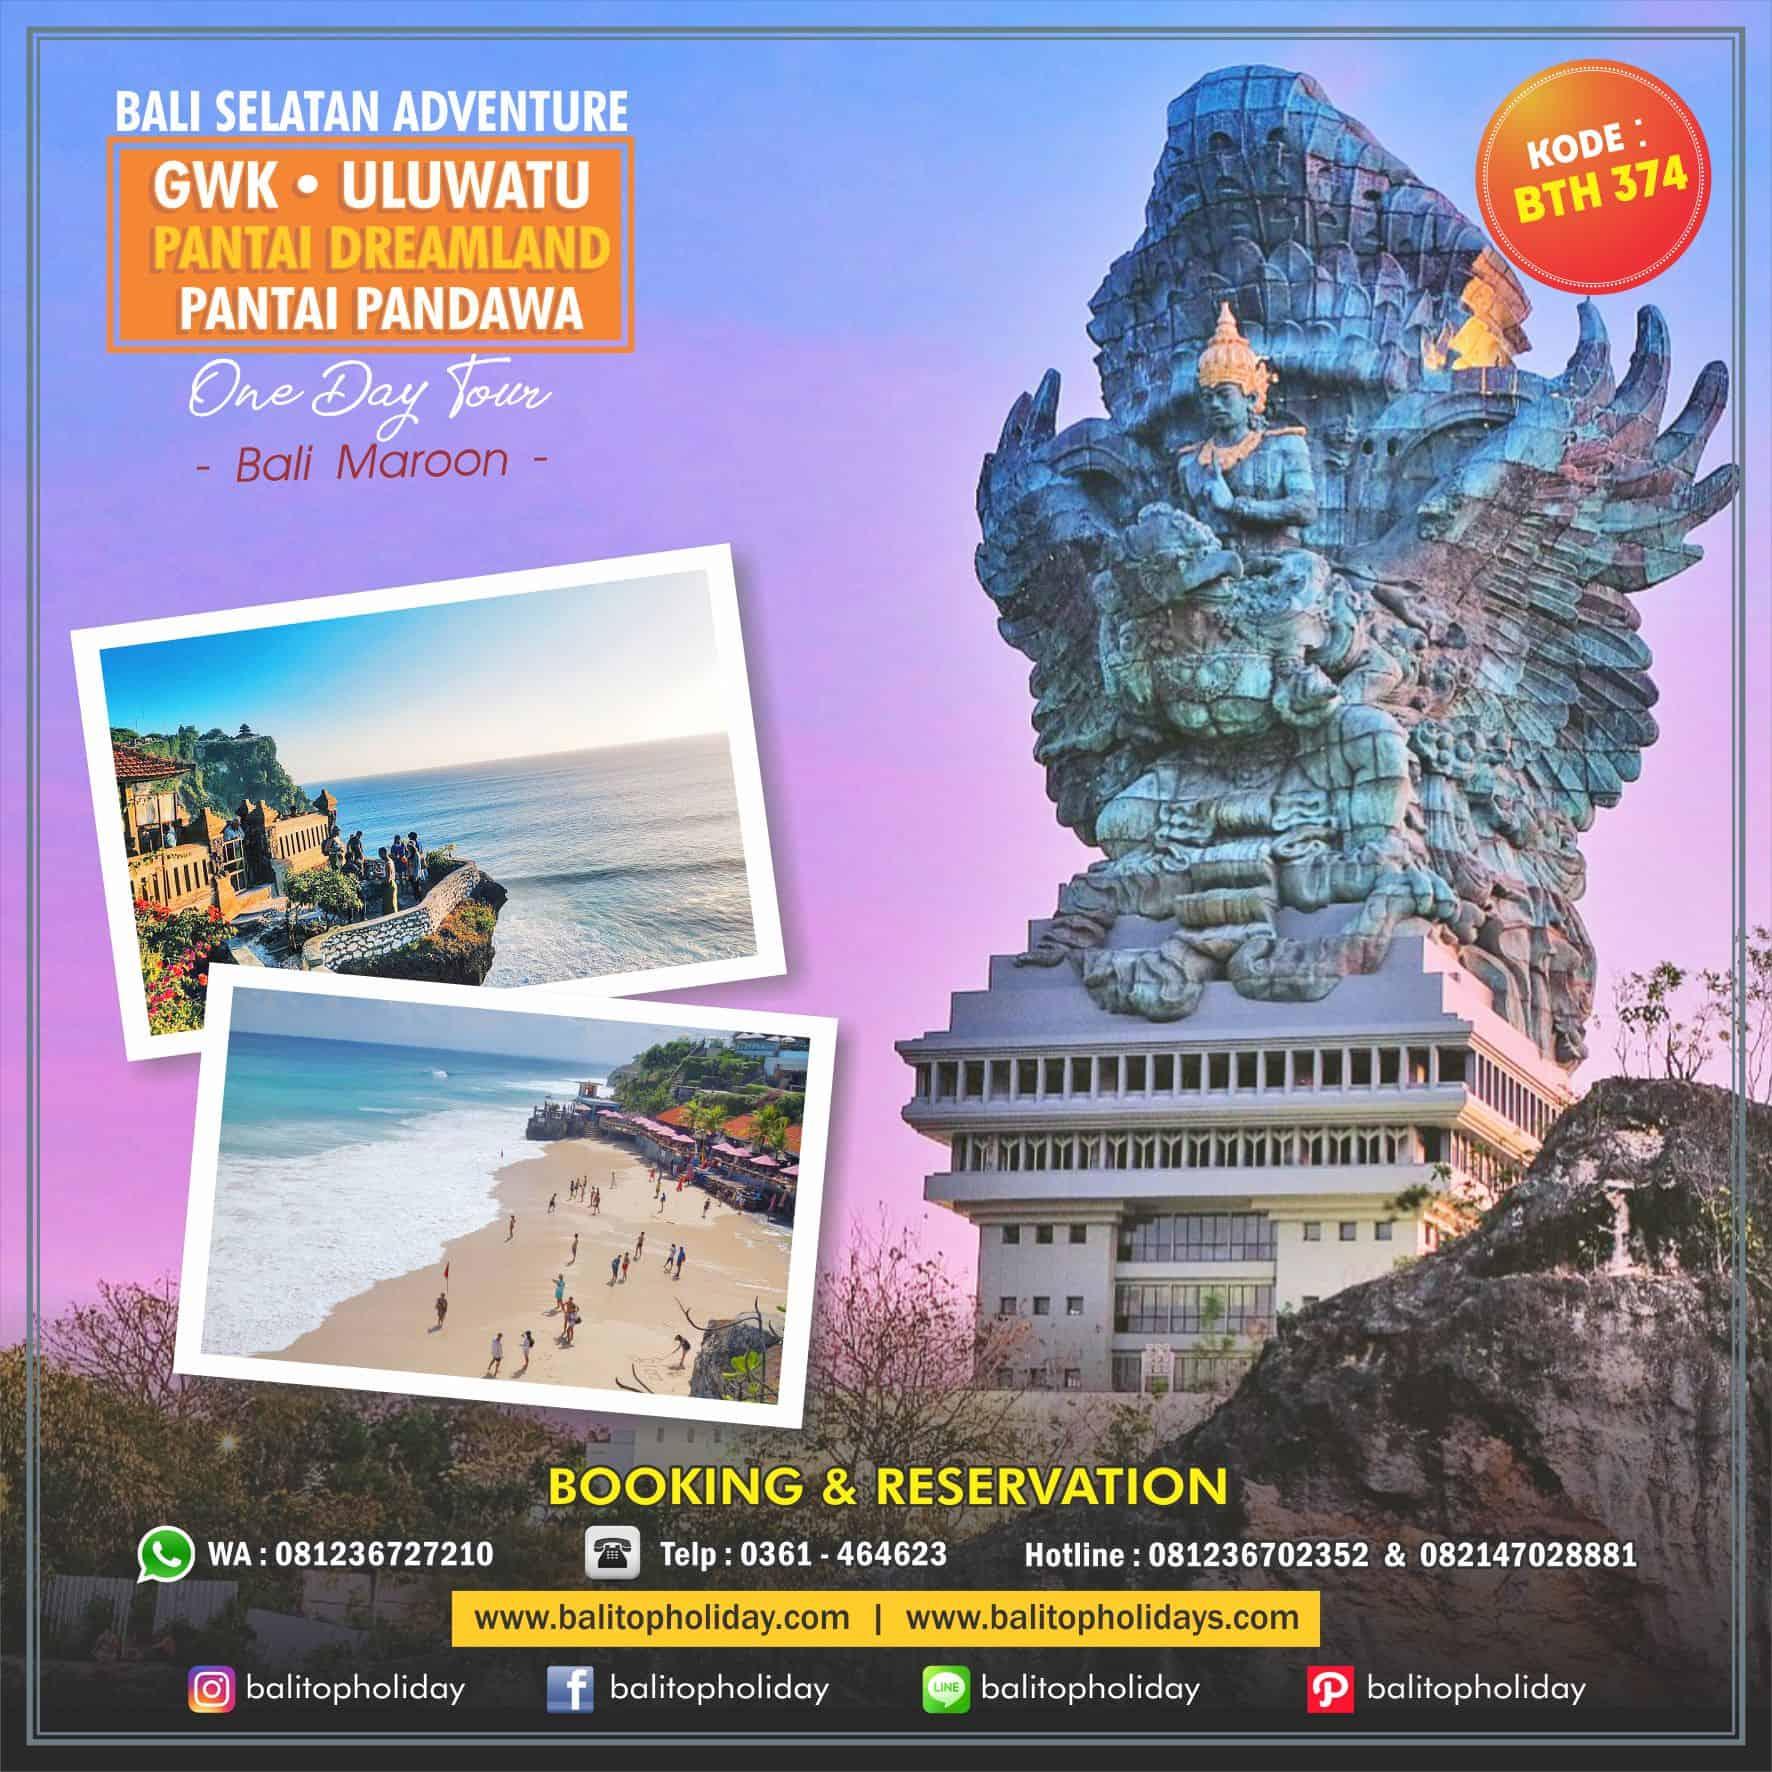 Bali Selatan Adventure One Day Tour BTH 374 Bali Maroon